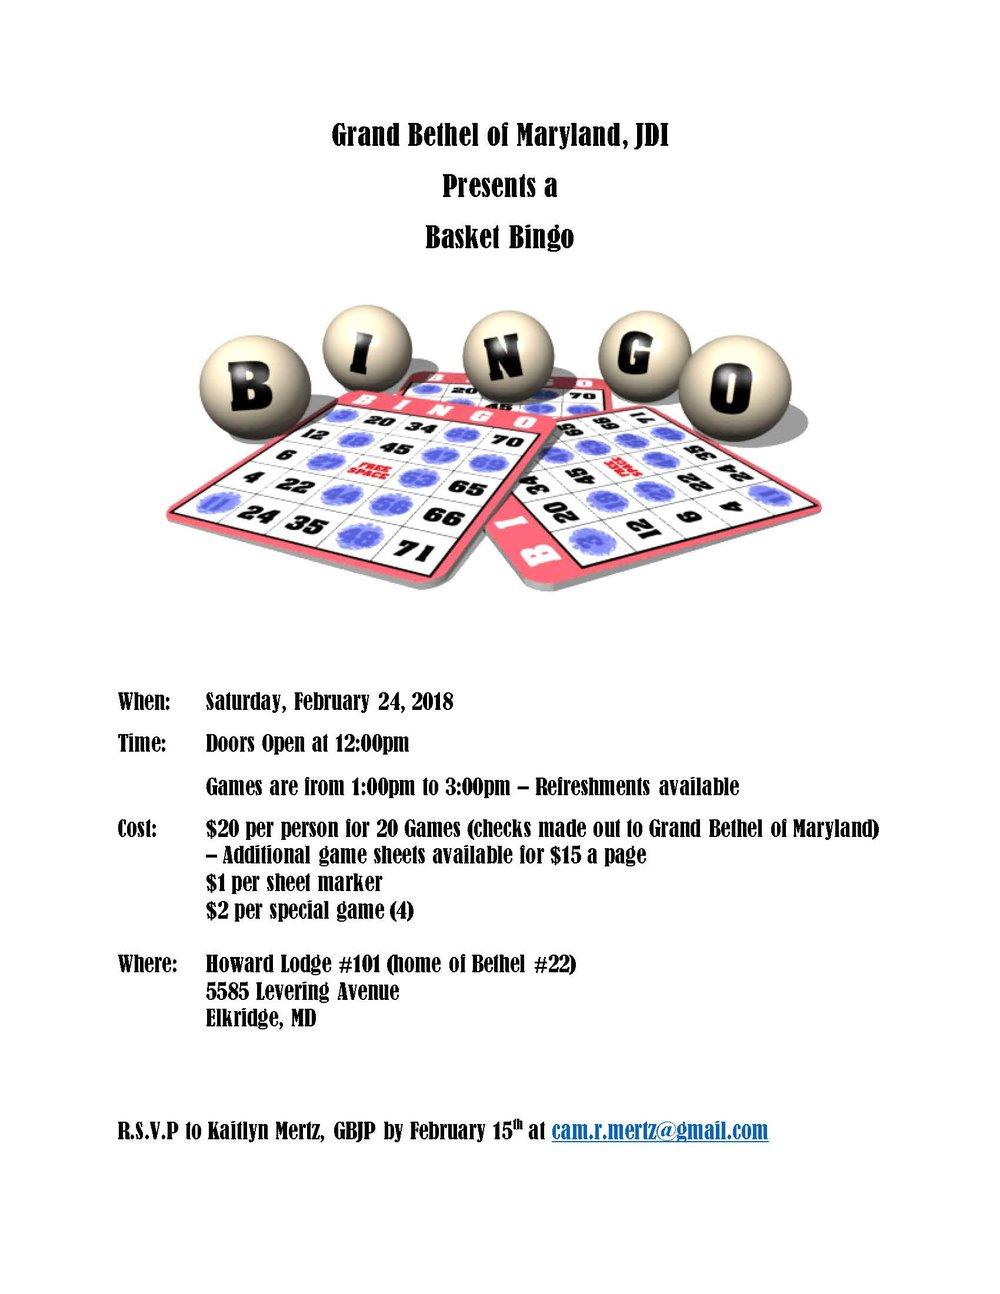 GB Basket Bingo Flyer 2018.jpg